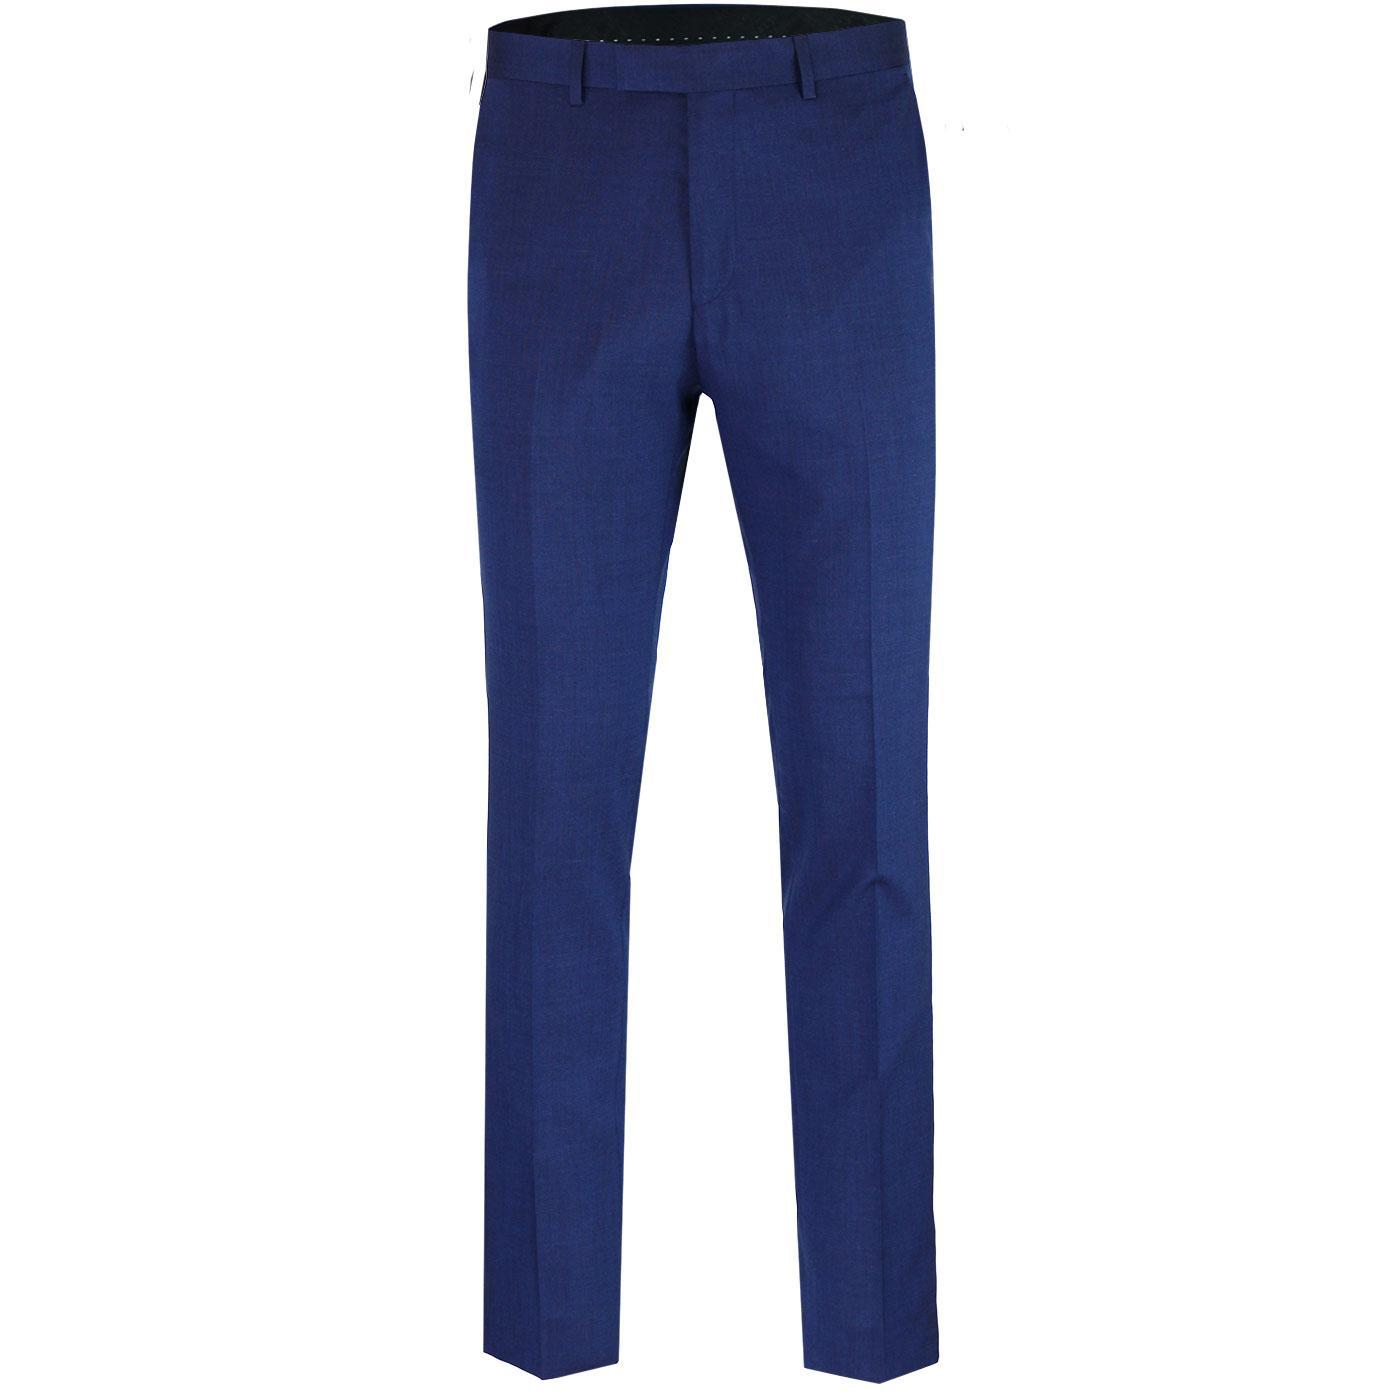 BEN SHERMAN Tailoring Mod Tonic Suit Trousers BLUE